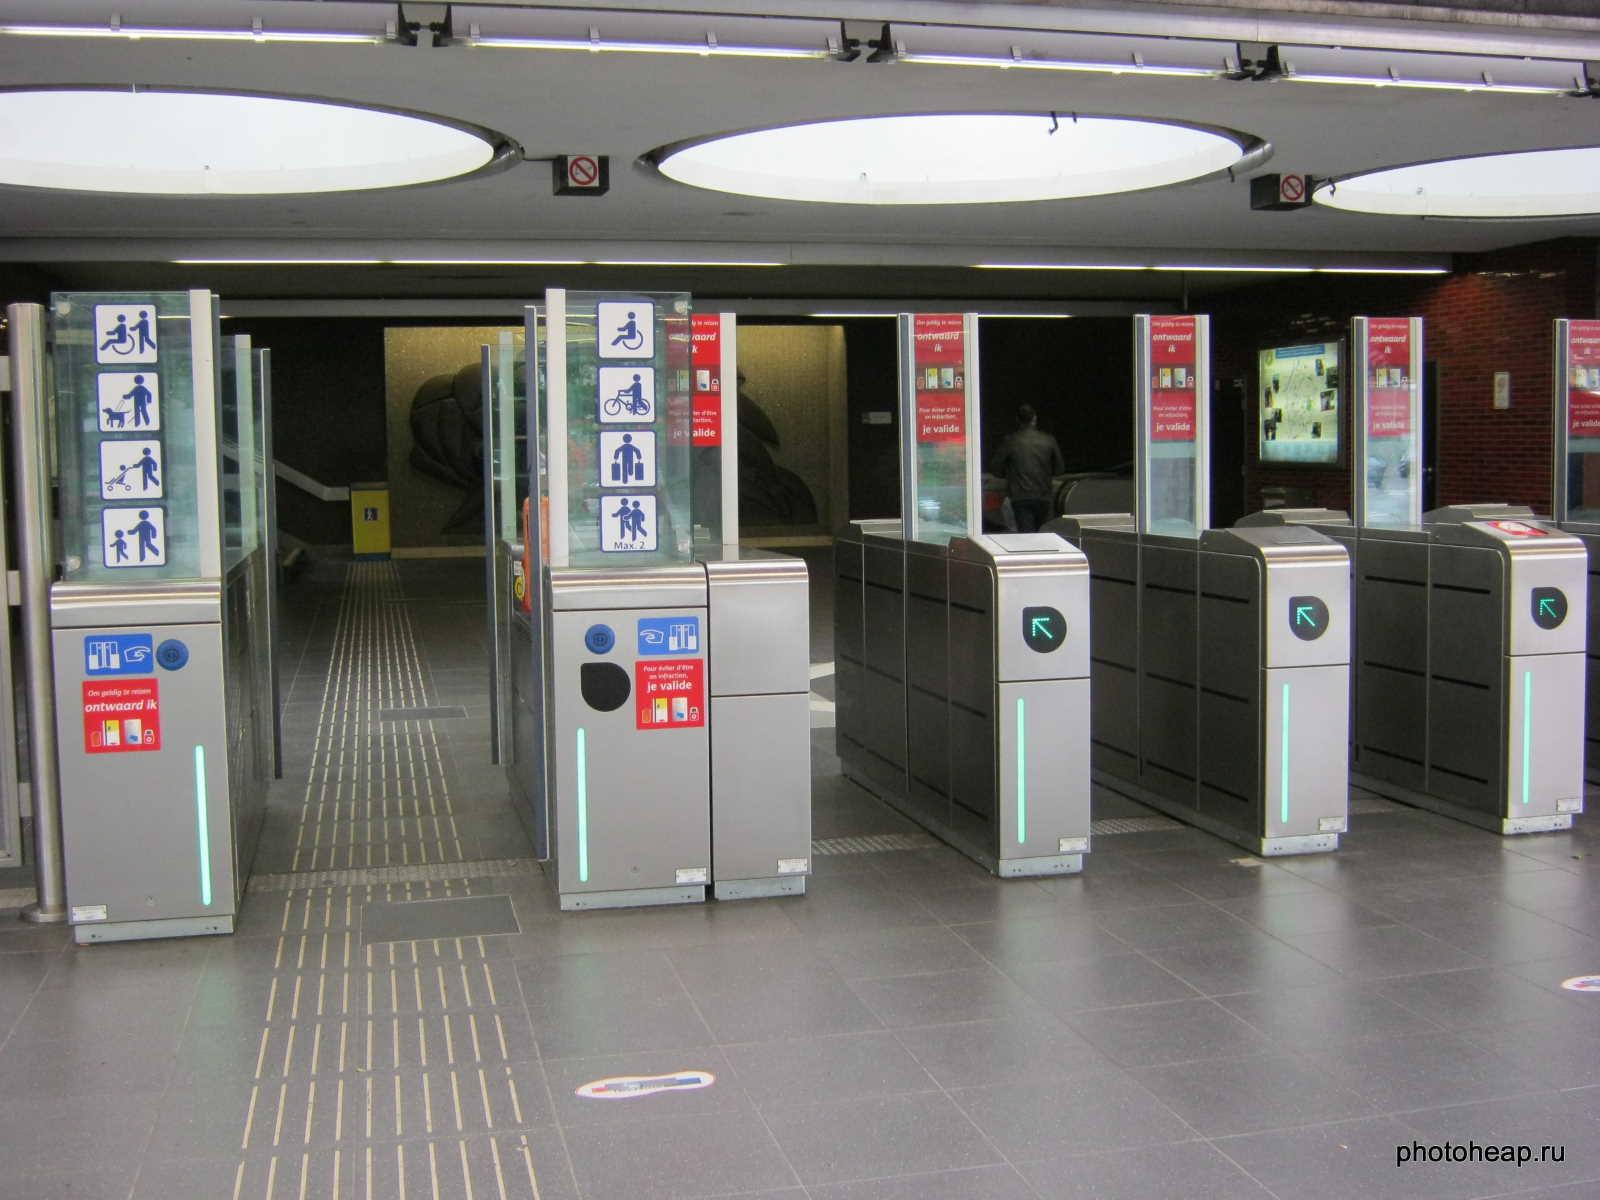 Brussels - Metro entrance